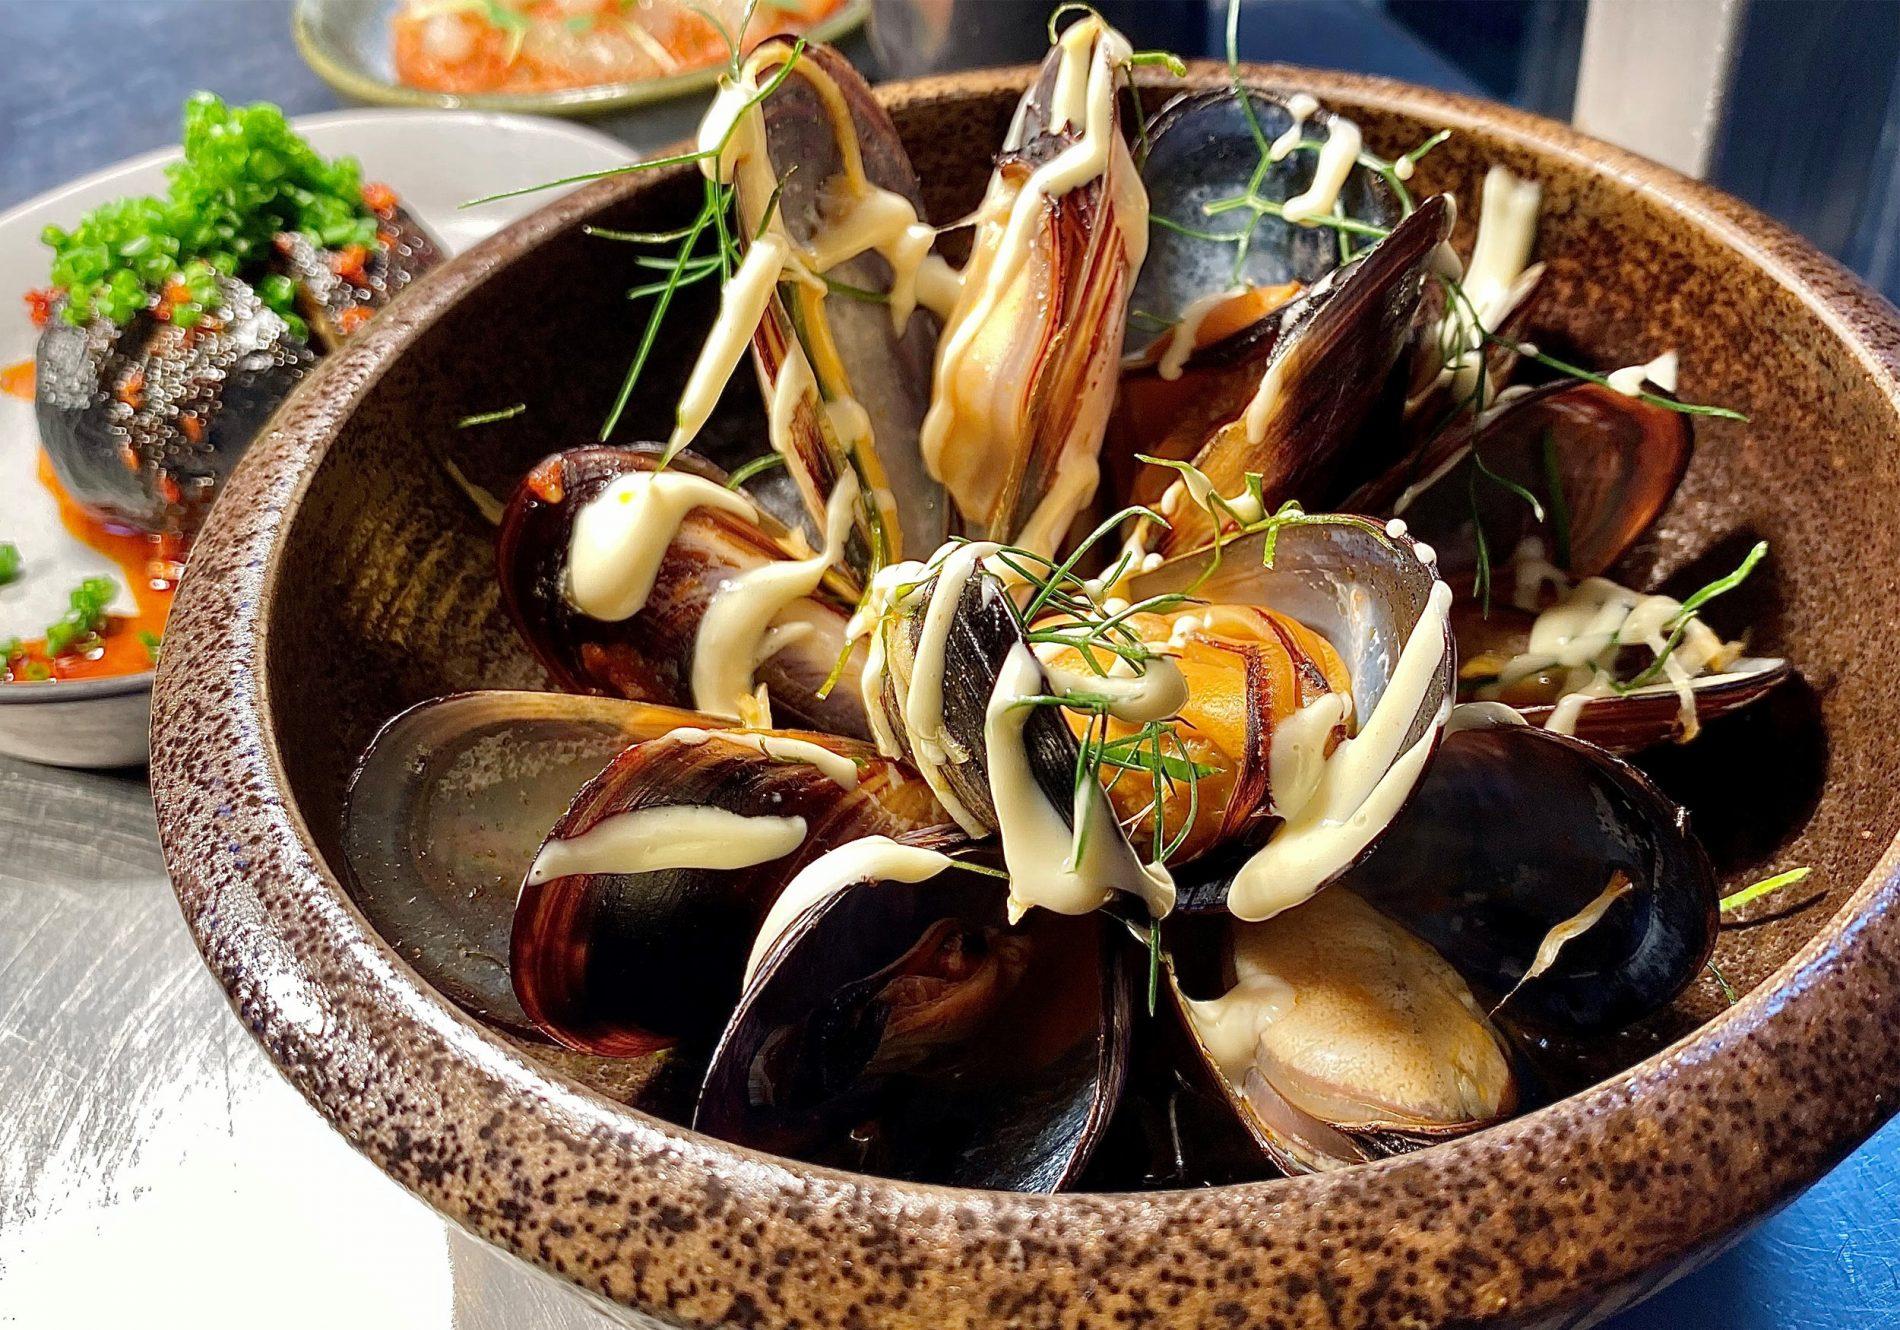 Gochujang mussels by Indochine head chef Virgil Kahn